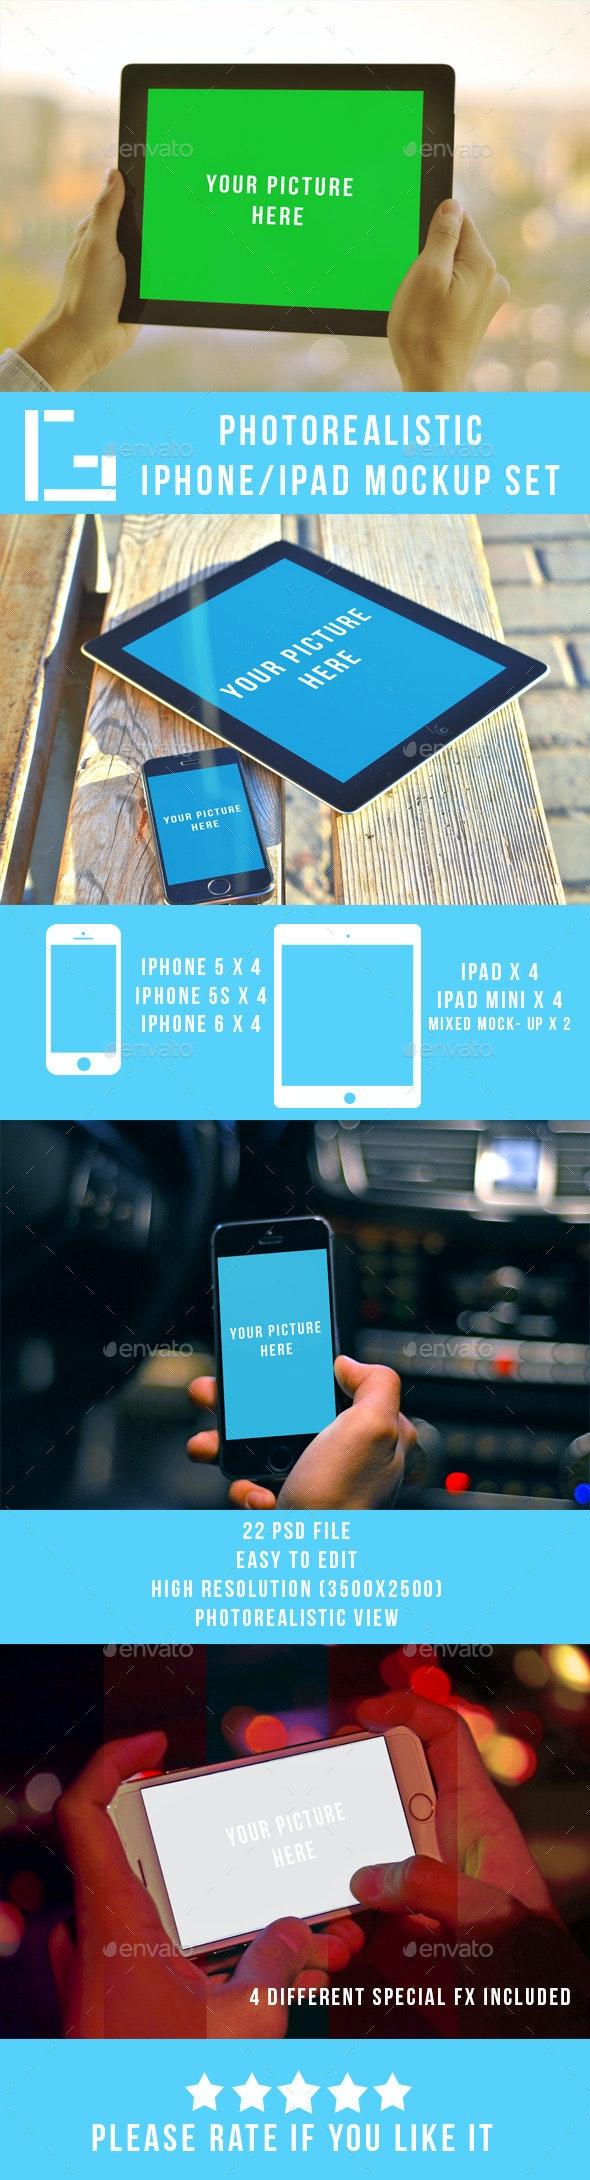 Photorealistic Iphone/Ipad Mock-up set - Multiple Displays